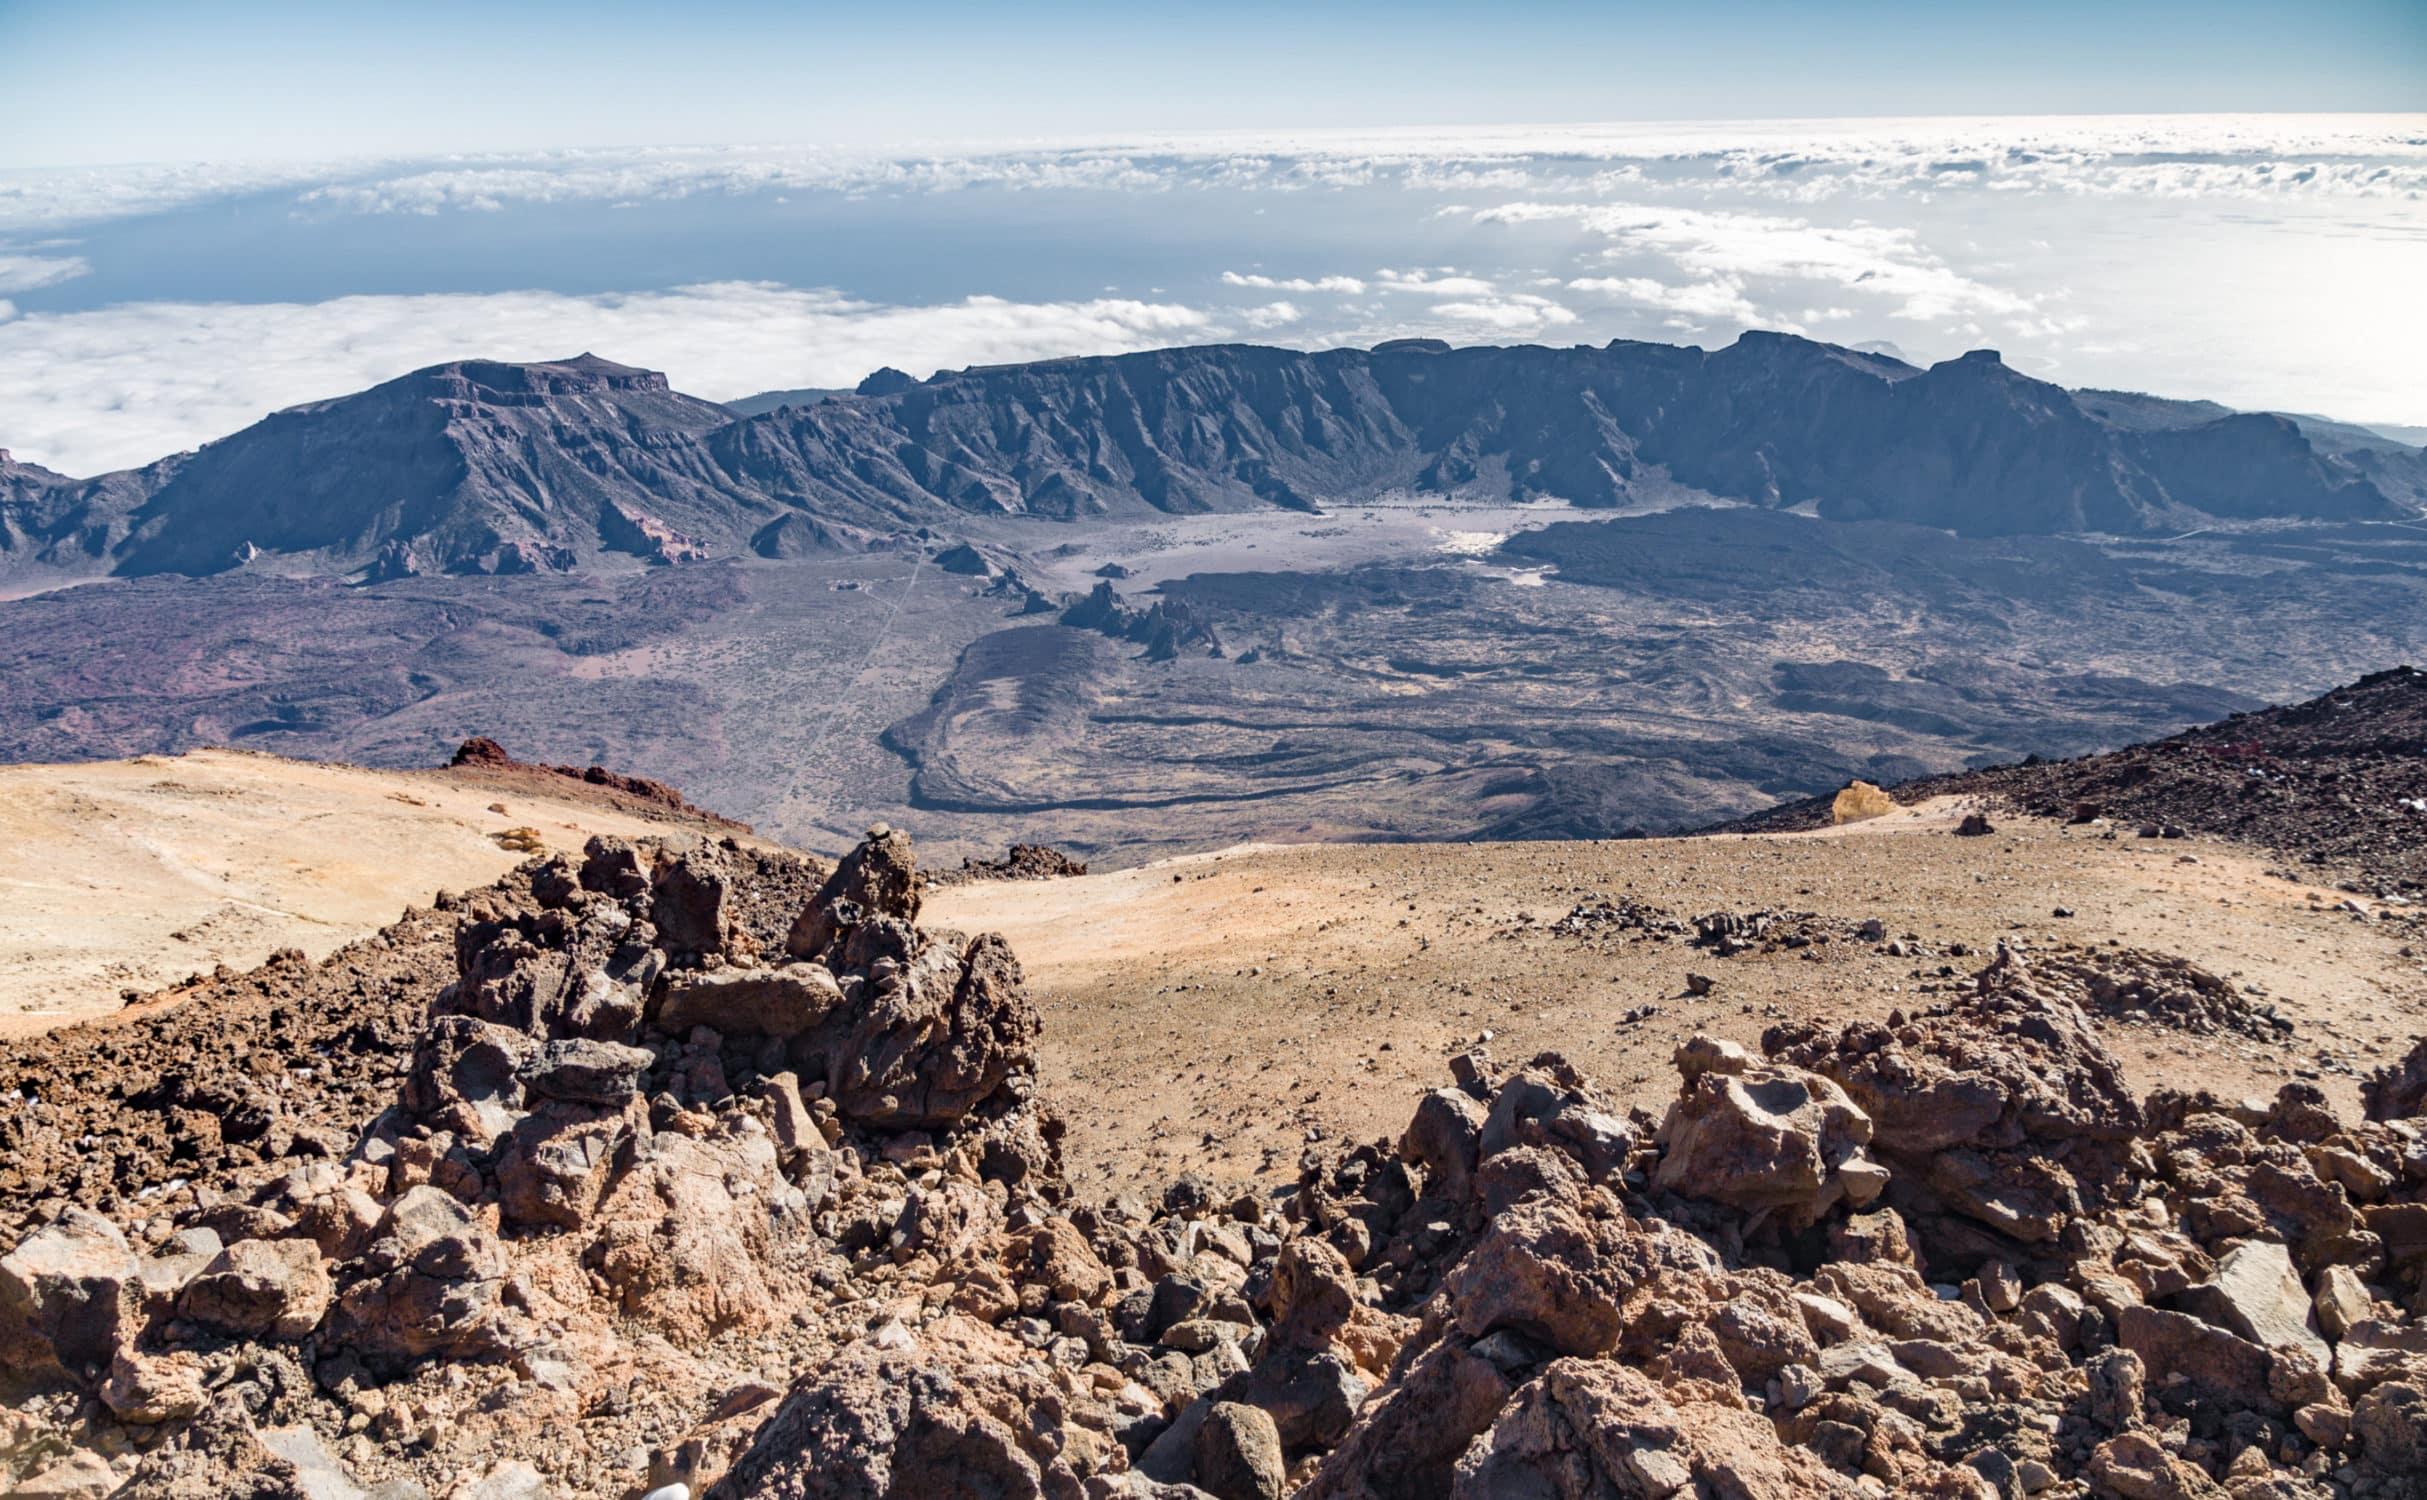 Caldera des Vulkans Teide